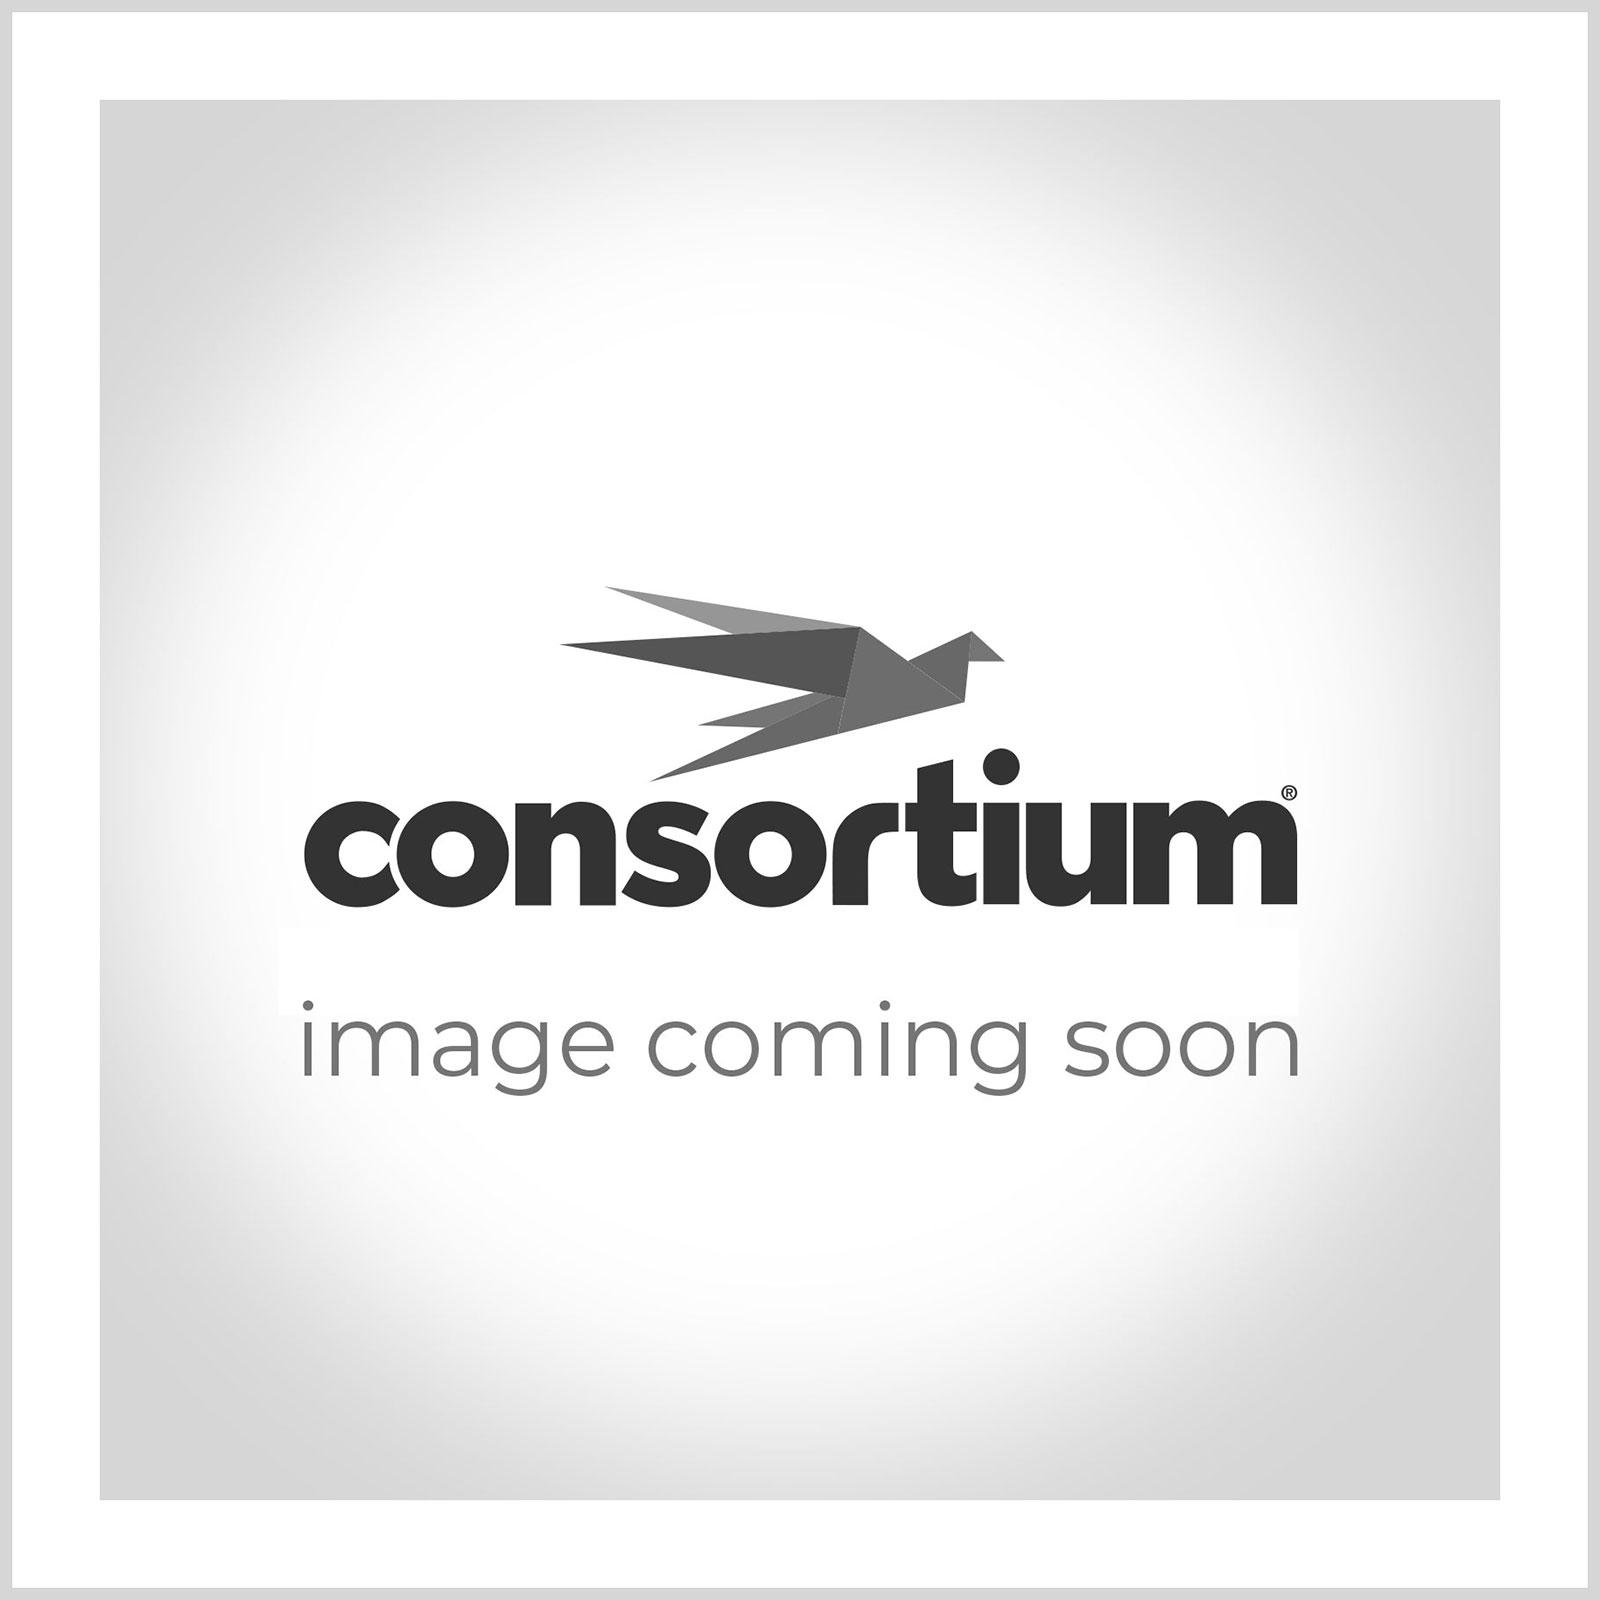 Straight Cut Bordette® Border Rolls